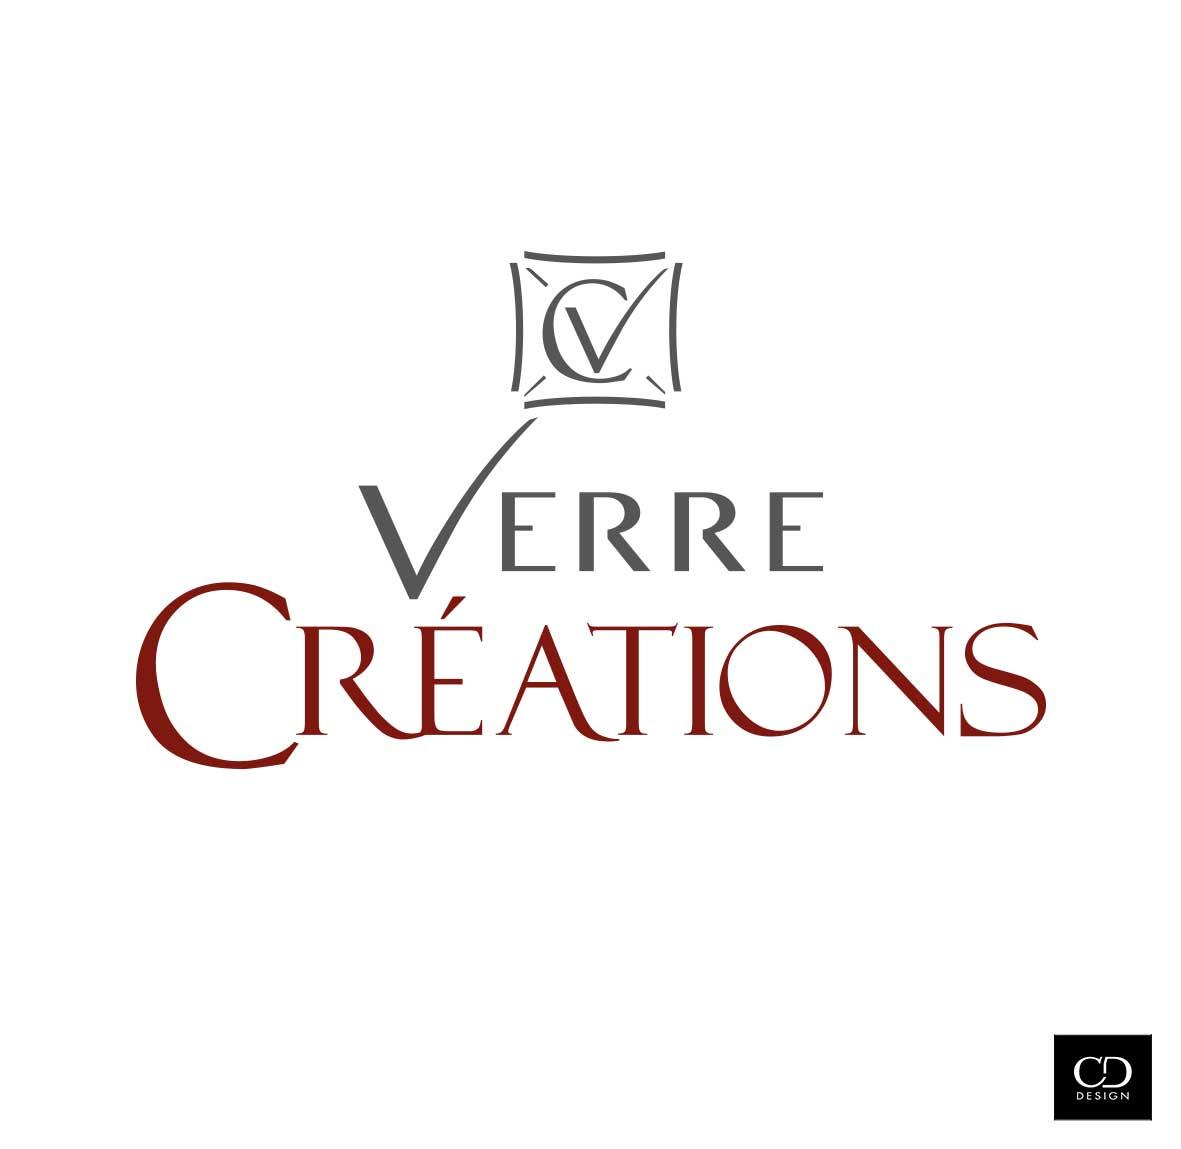 VERRE CREATIONS